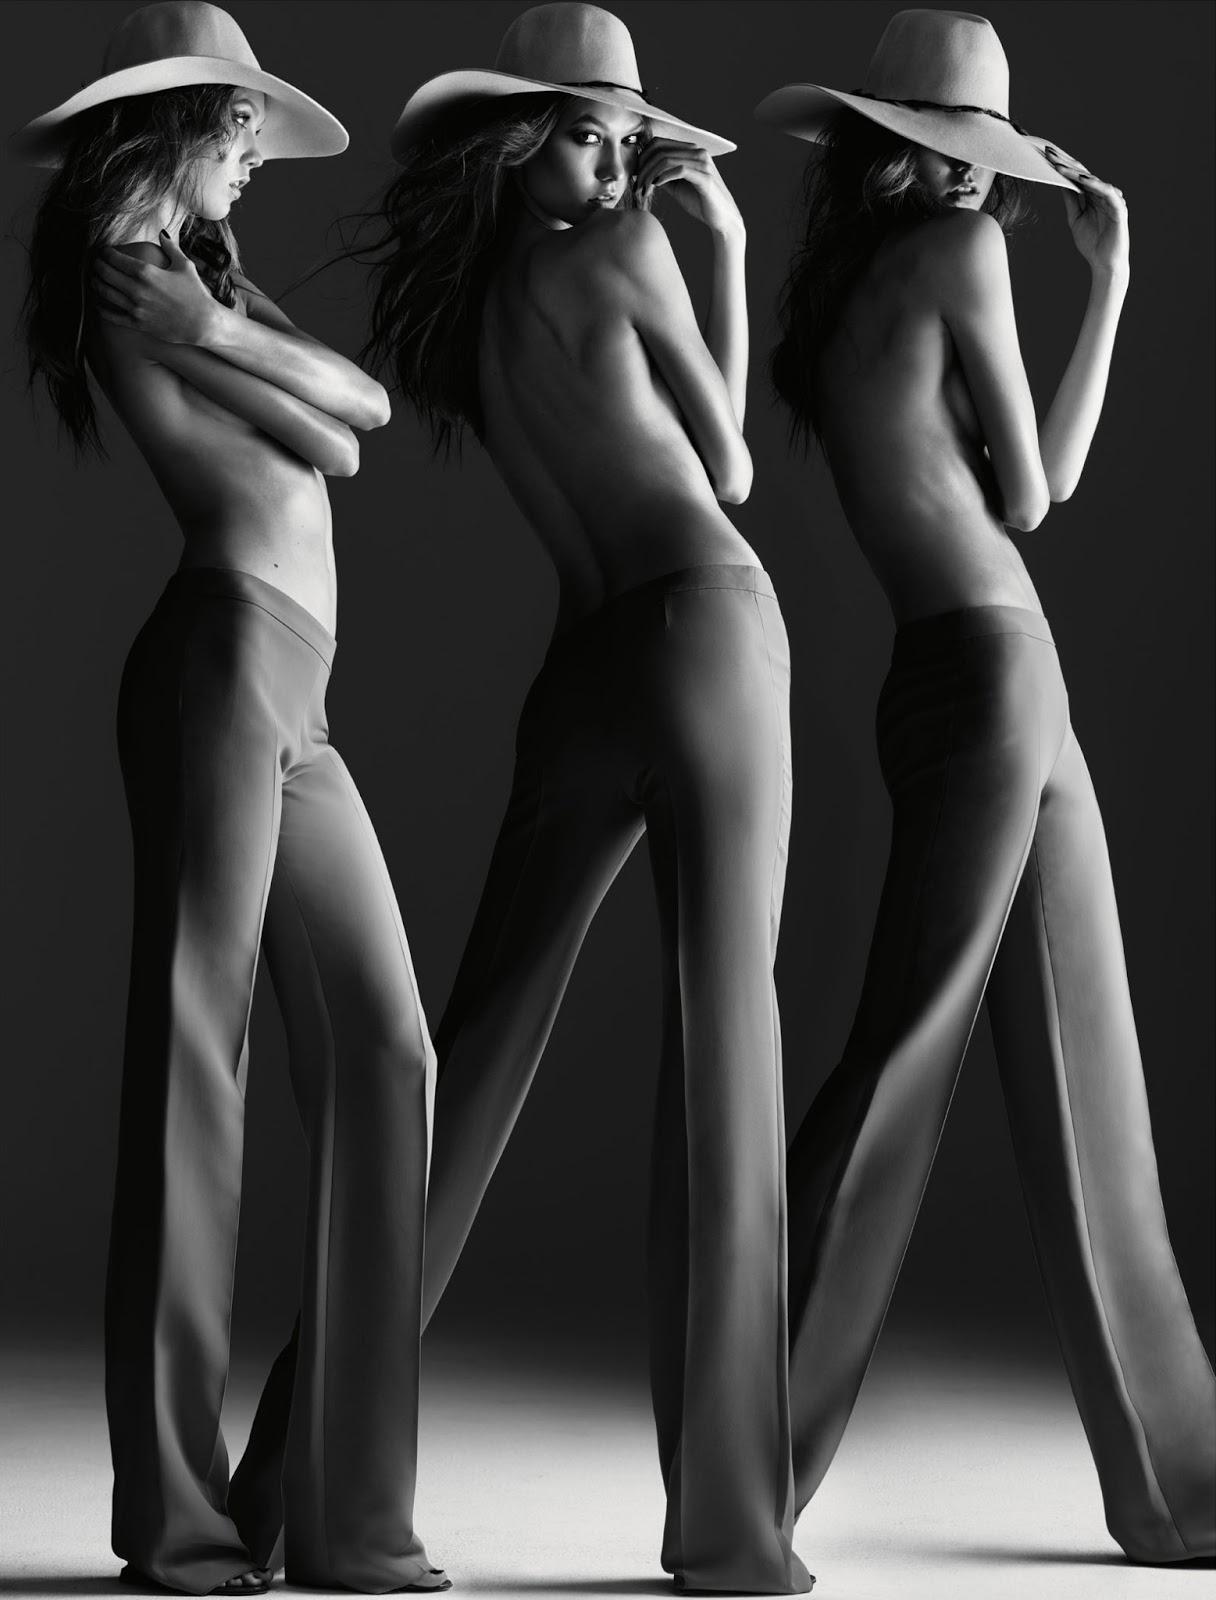 http://1.bp.blogspot.com/-_UWO6NaXnu0/URE0WViP6DI/AAAAAAAAgHY/xccib4BYXAE/s1600/Karlie+Kloss+by+Alexi+Lubomirski+%2528Esto+Es+Hollywood+-+Vogue+Spain+February+2013%2529.jpg